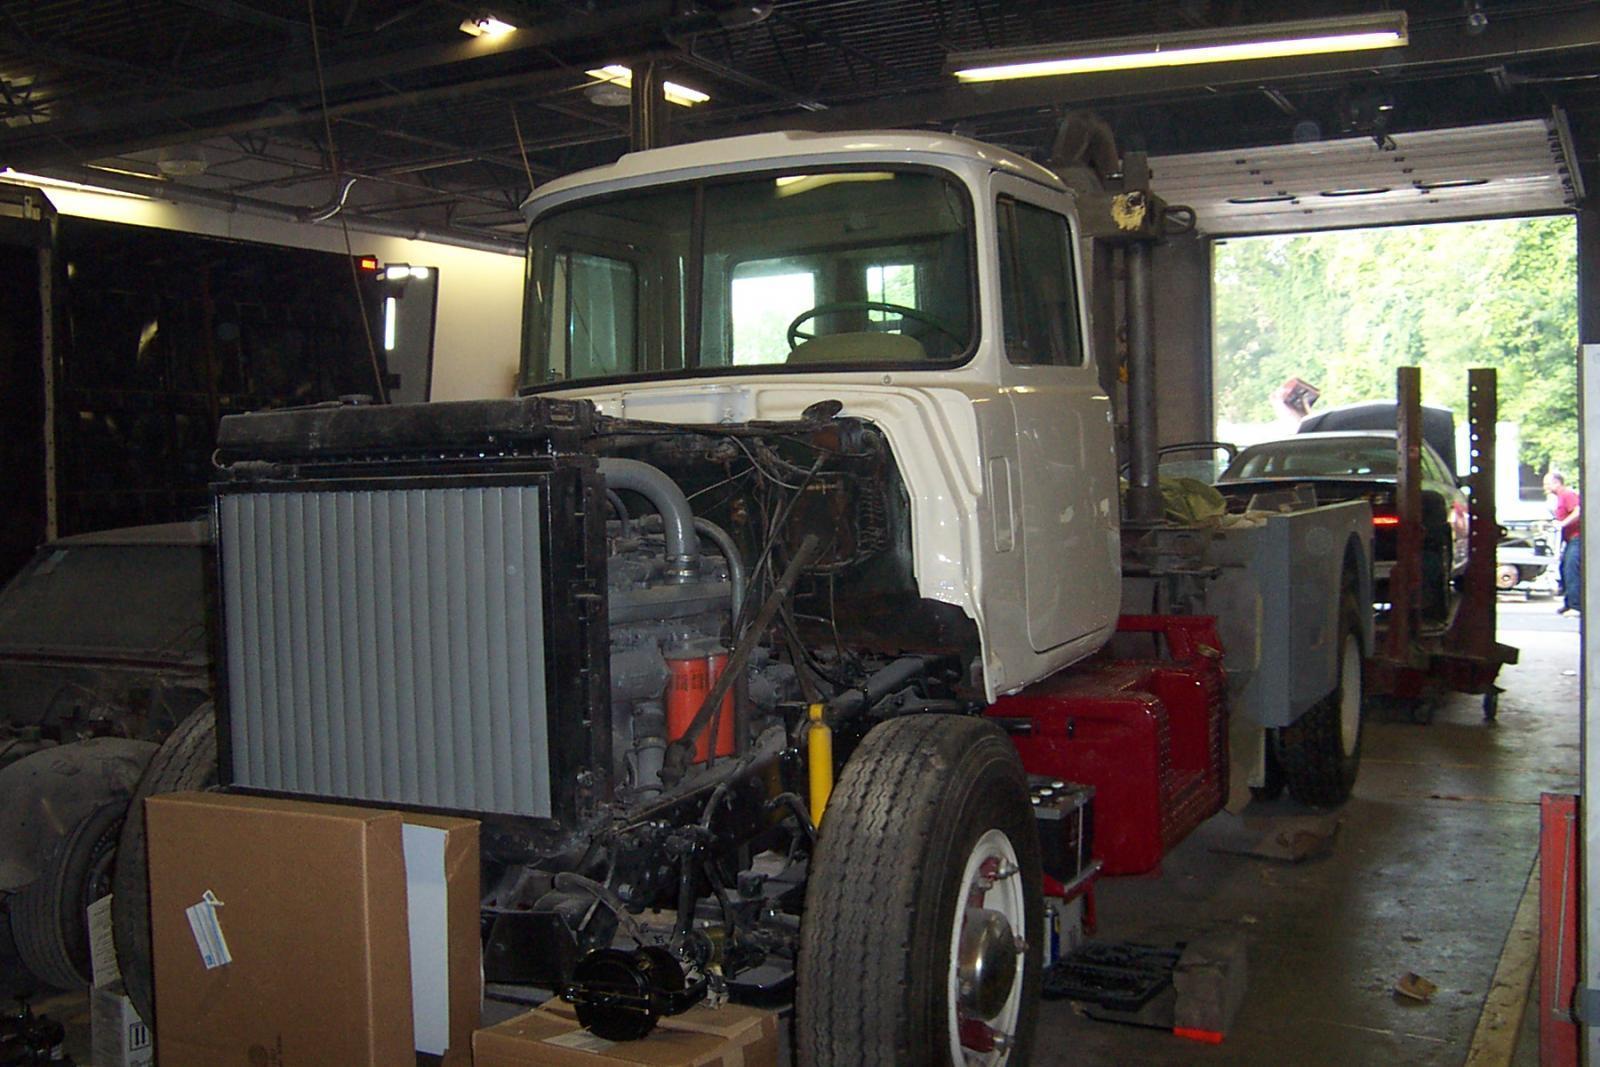 R-600 July of 2007